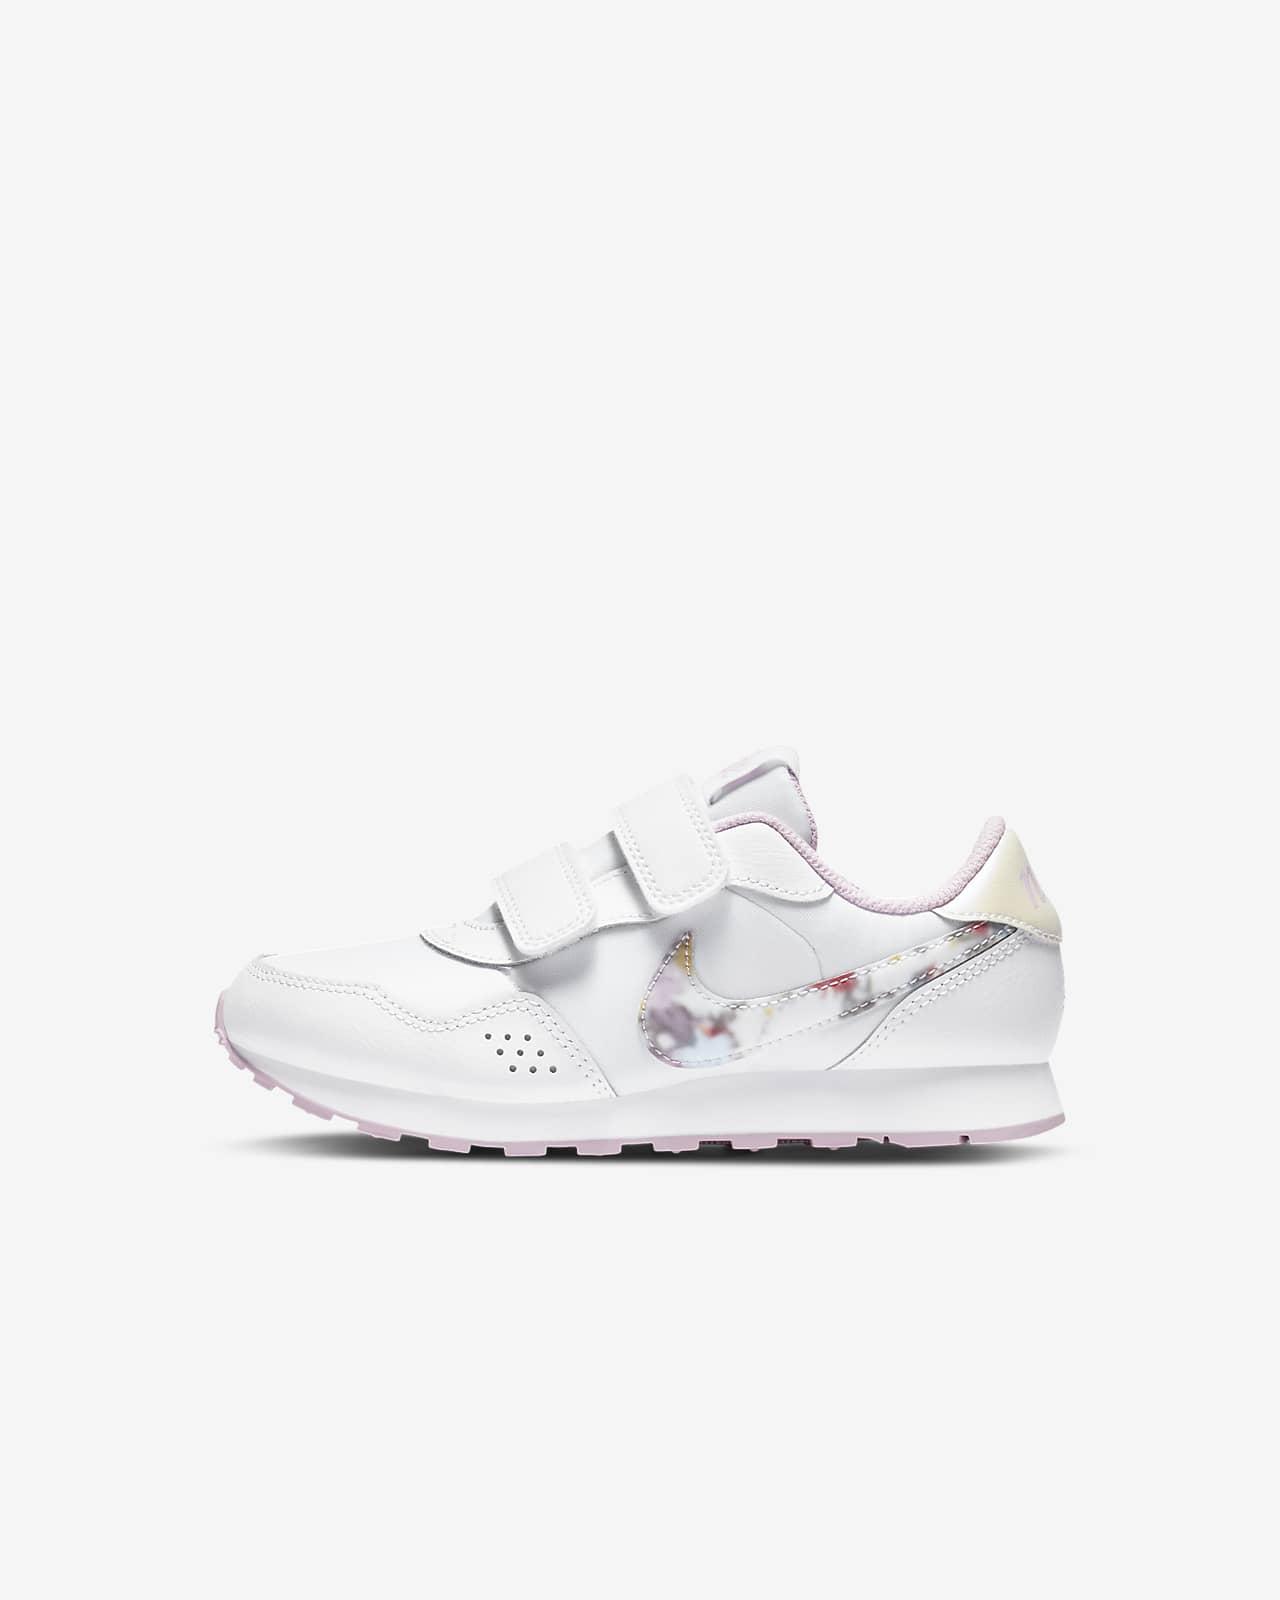 Nike MD Valiant Zapatillas - Niño/a pequeño/a